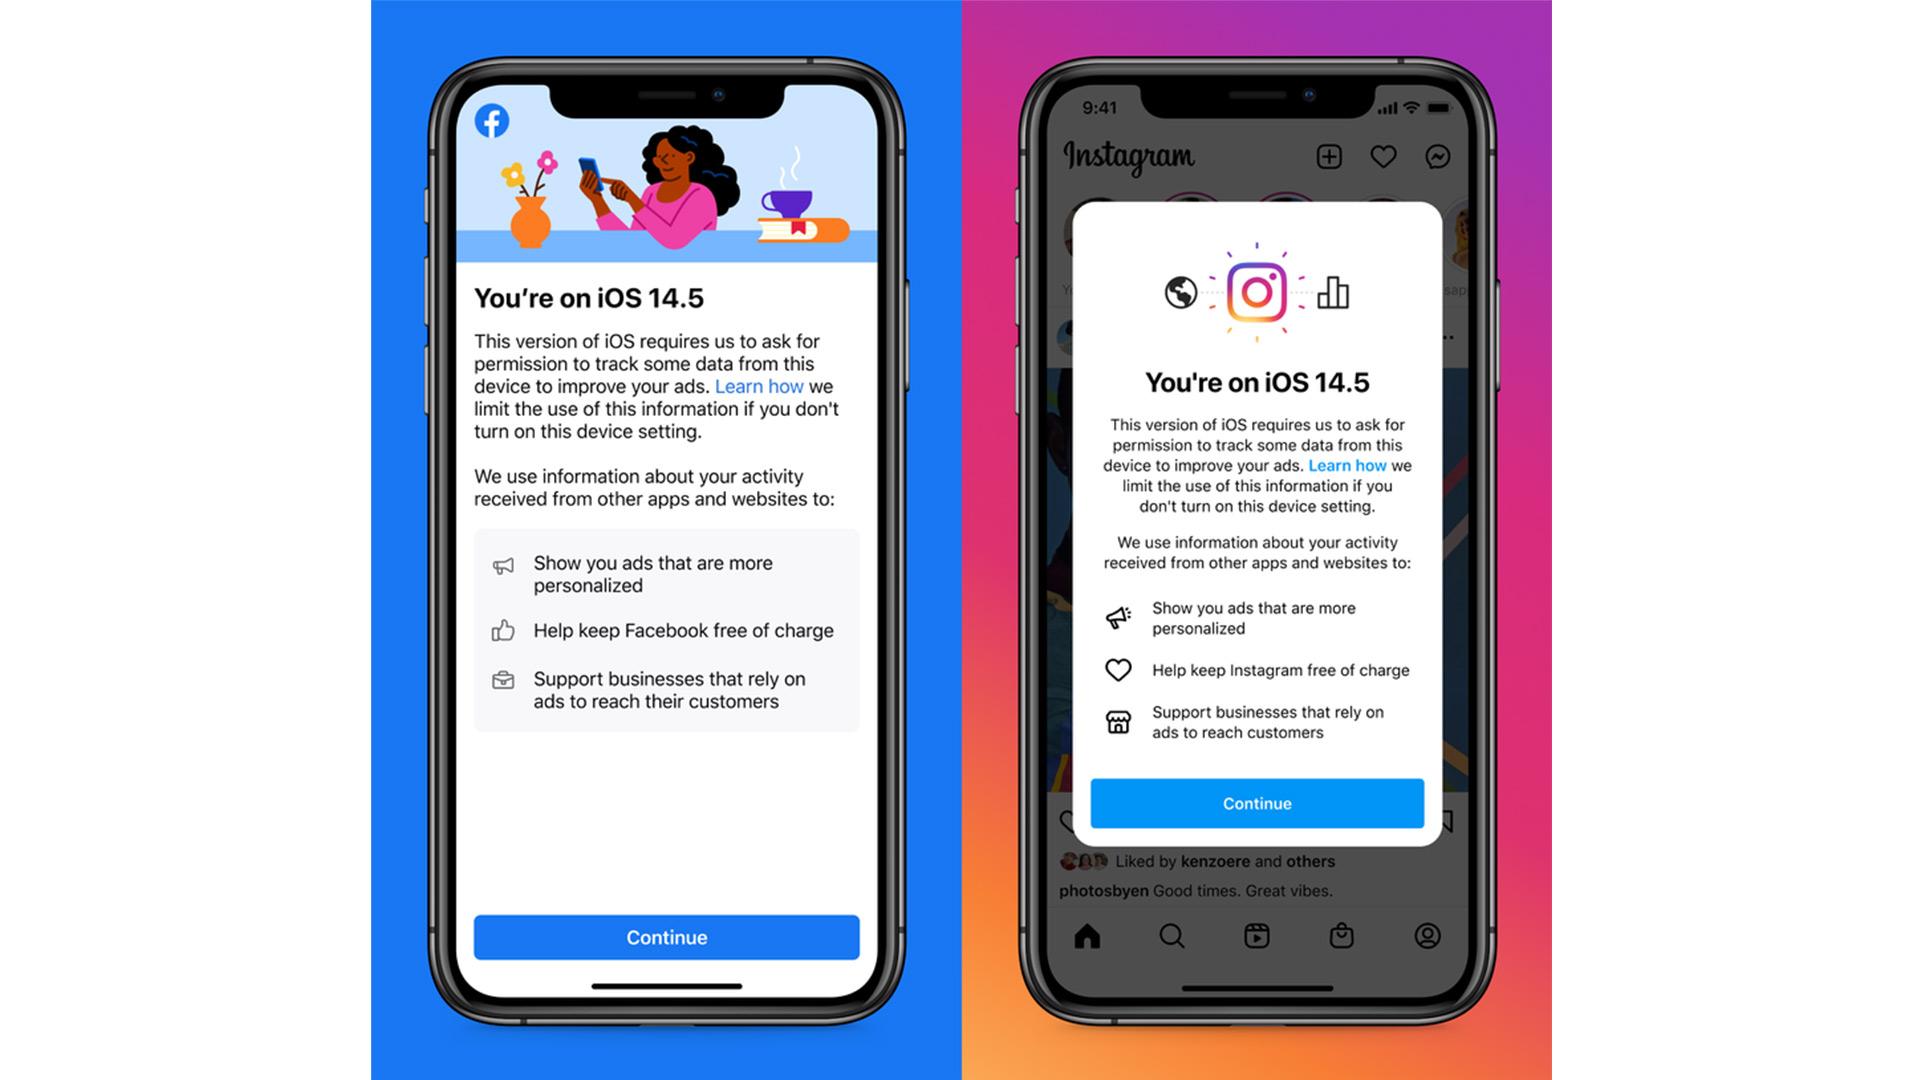 Facebook and Instagram's iOS 14.5 prompt